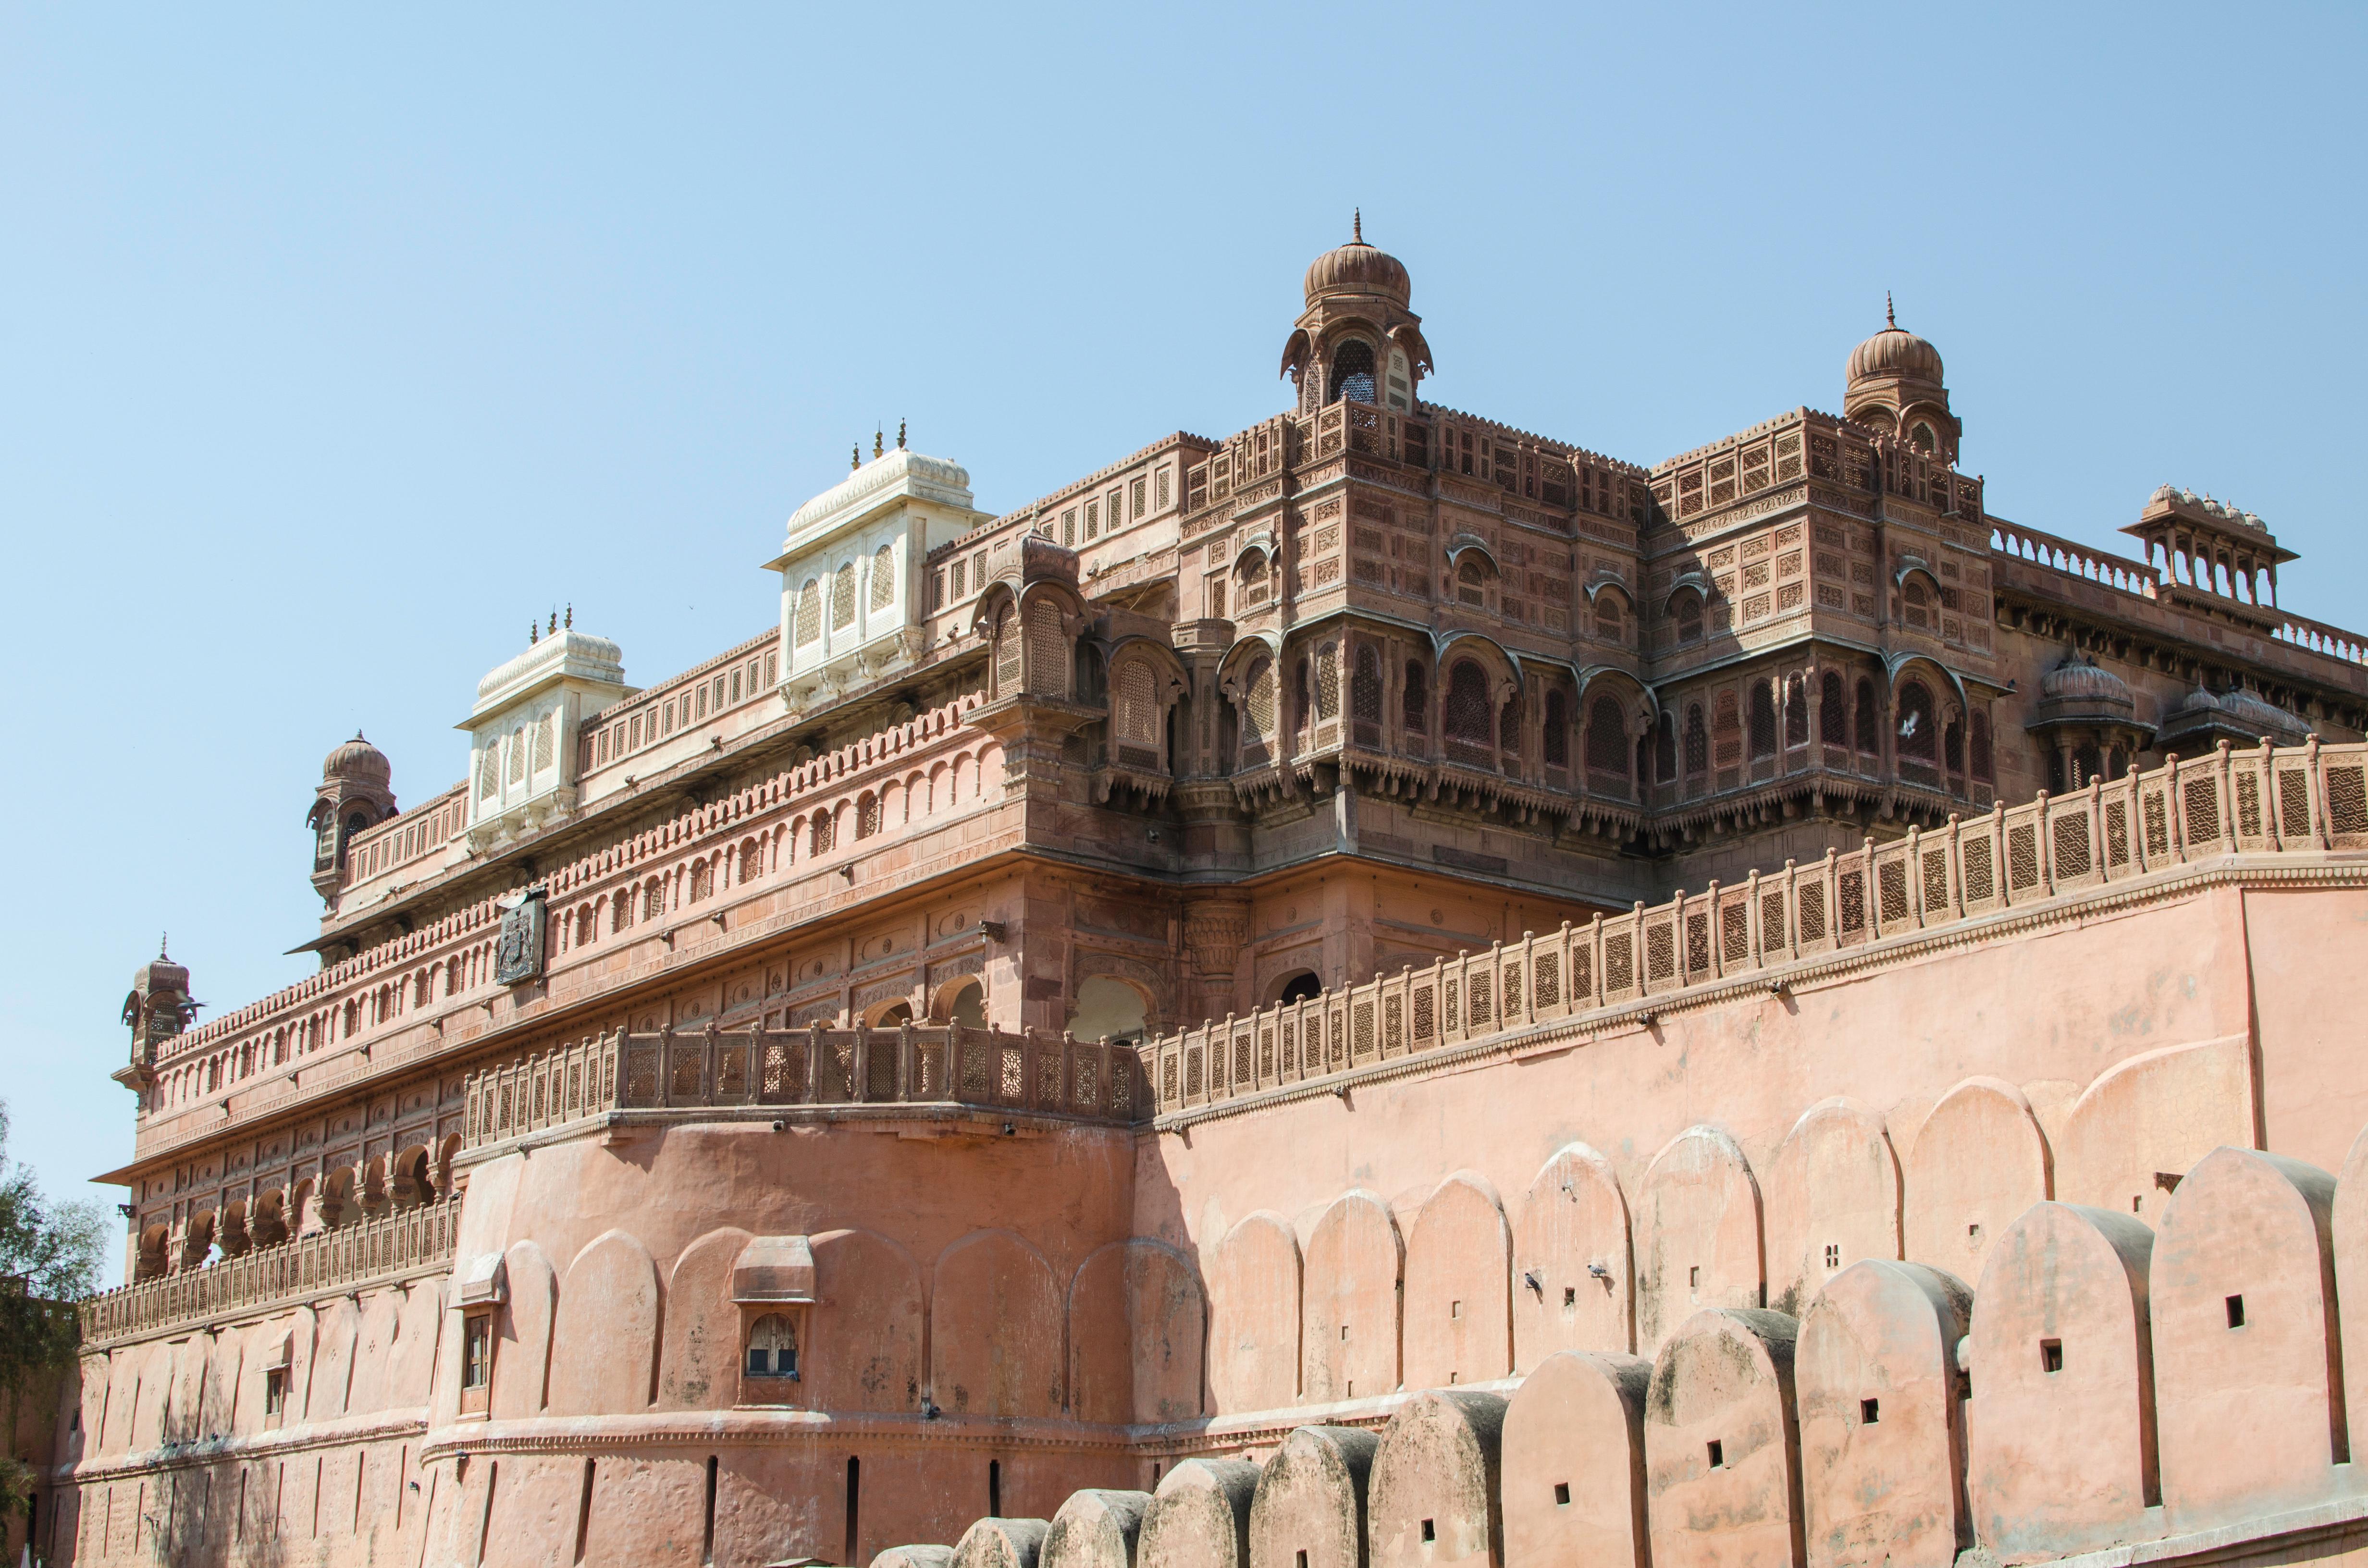 Bikaner, un alto en tu camino - India Gran Viaje Delhi, Jaipur, Agra